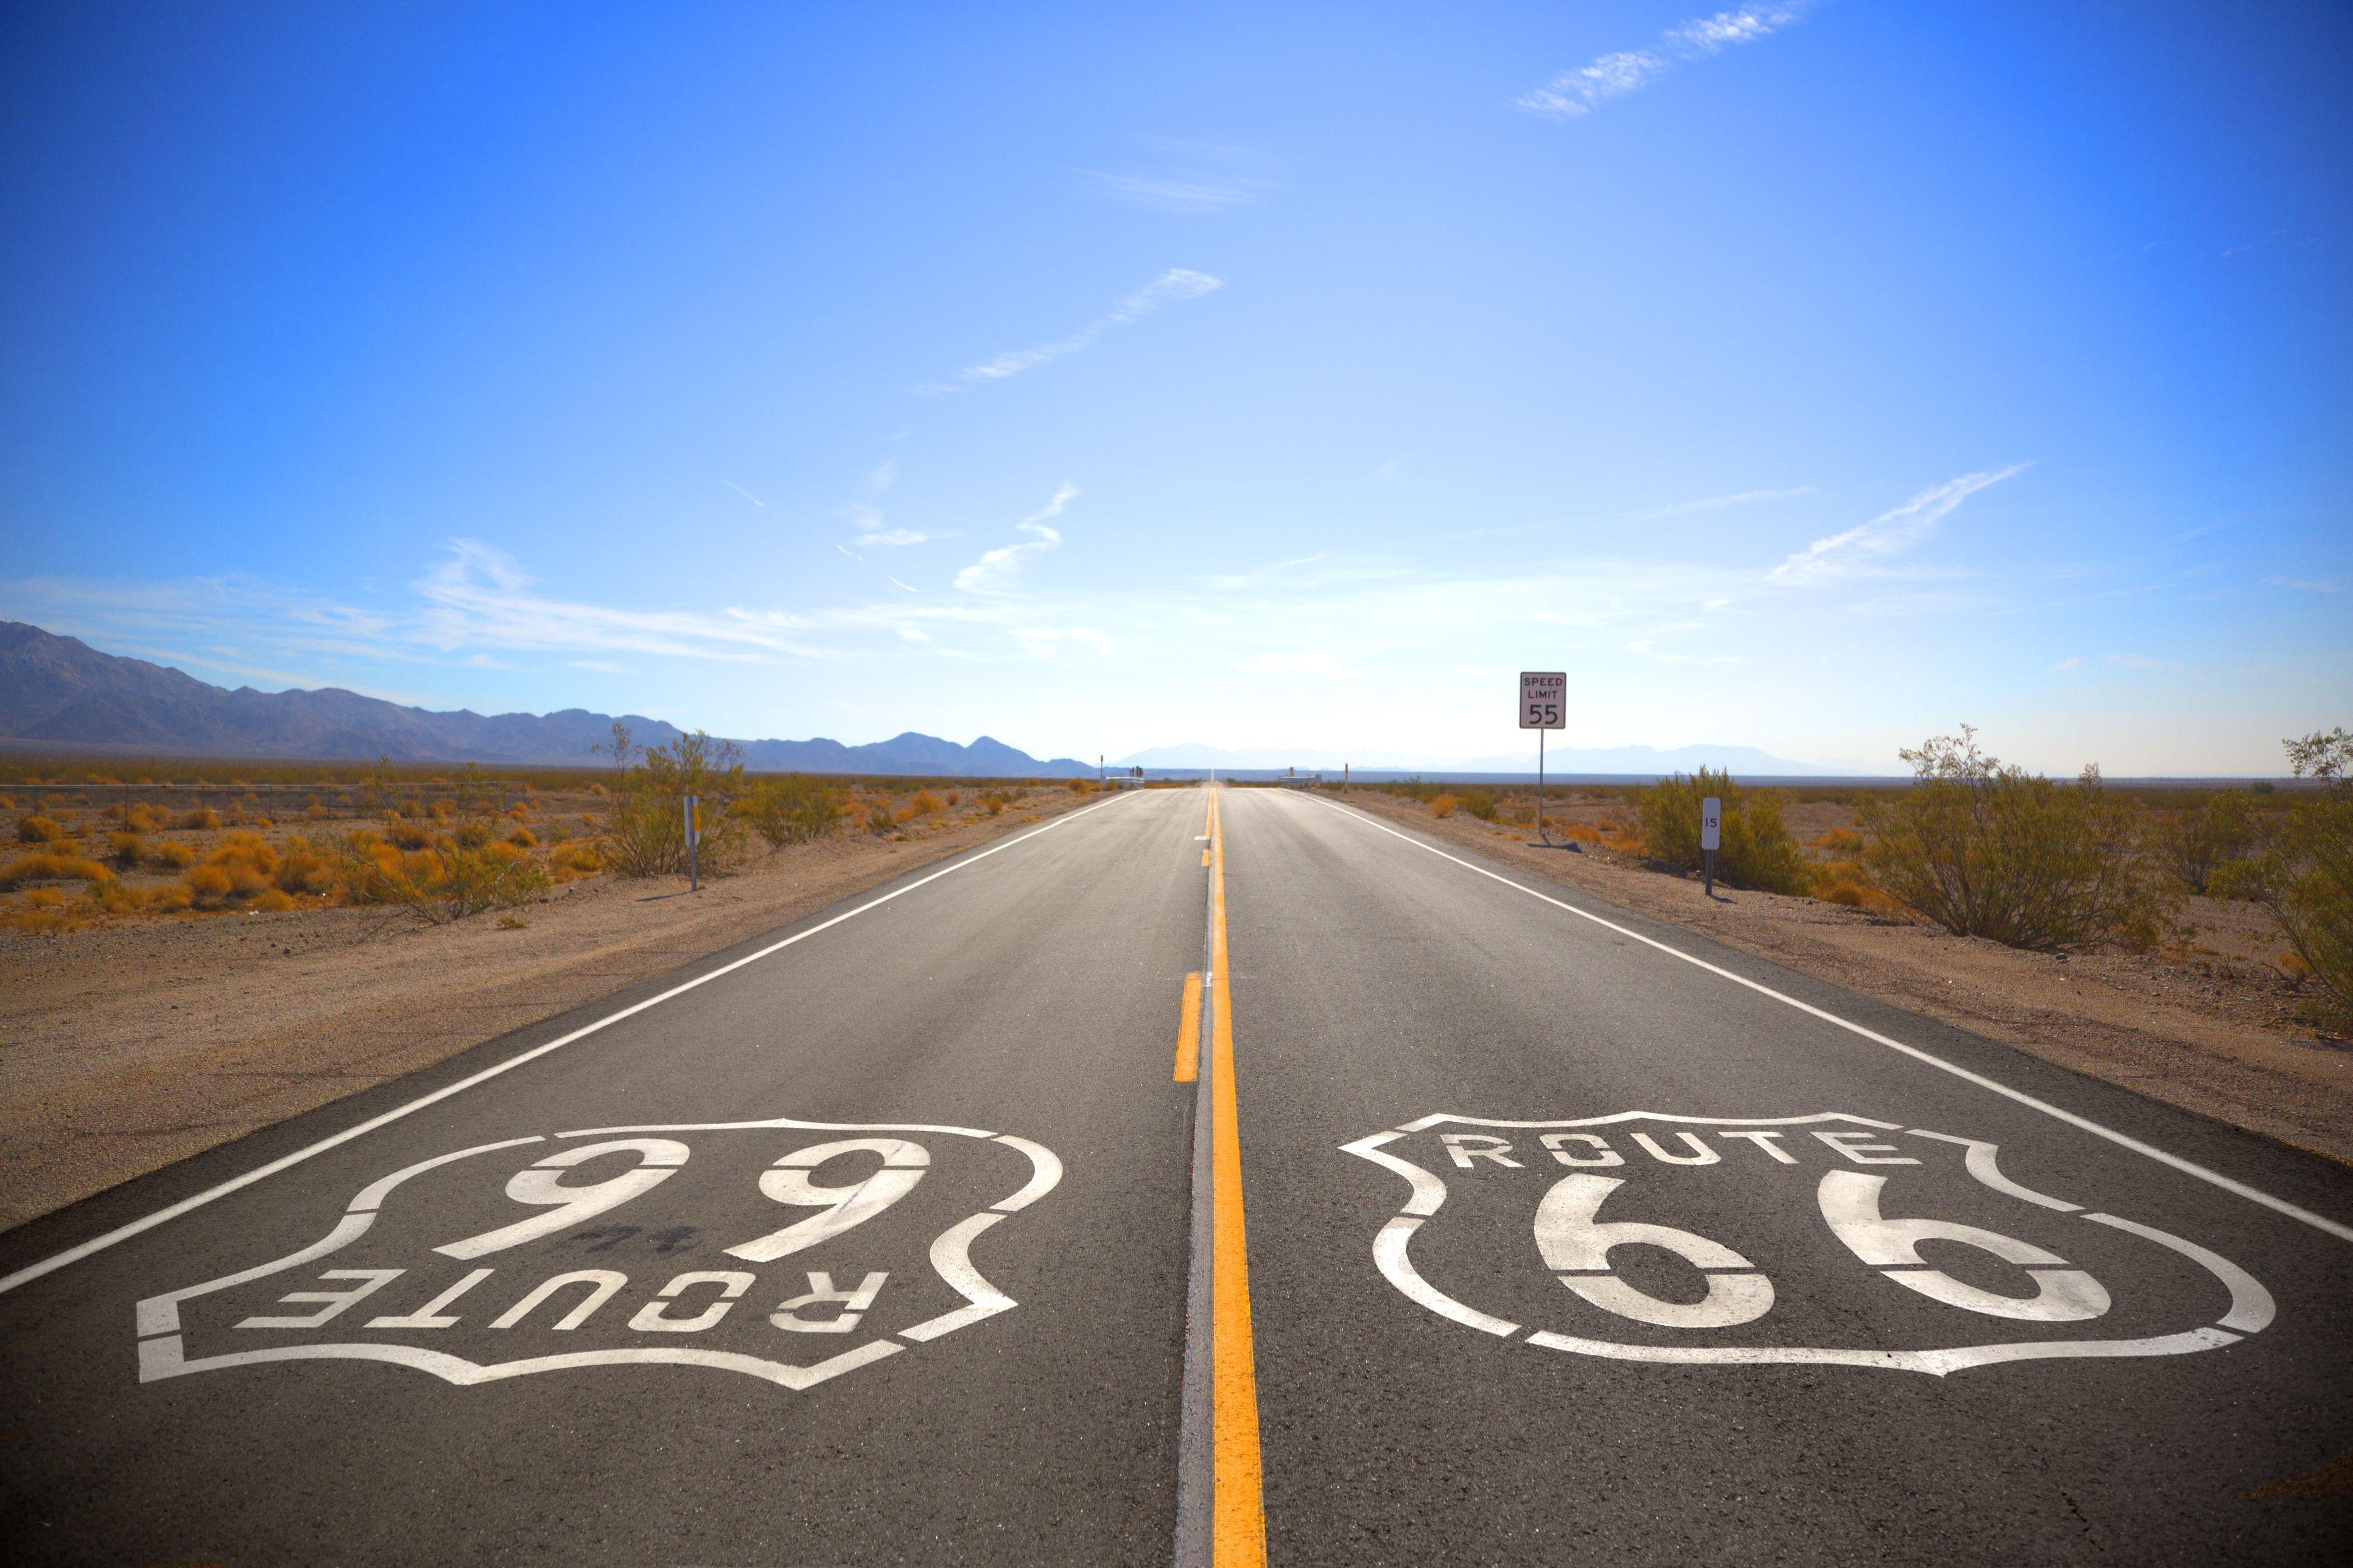 The Crew Route 66